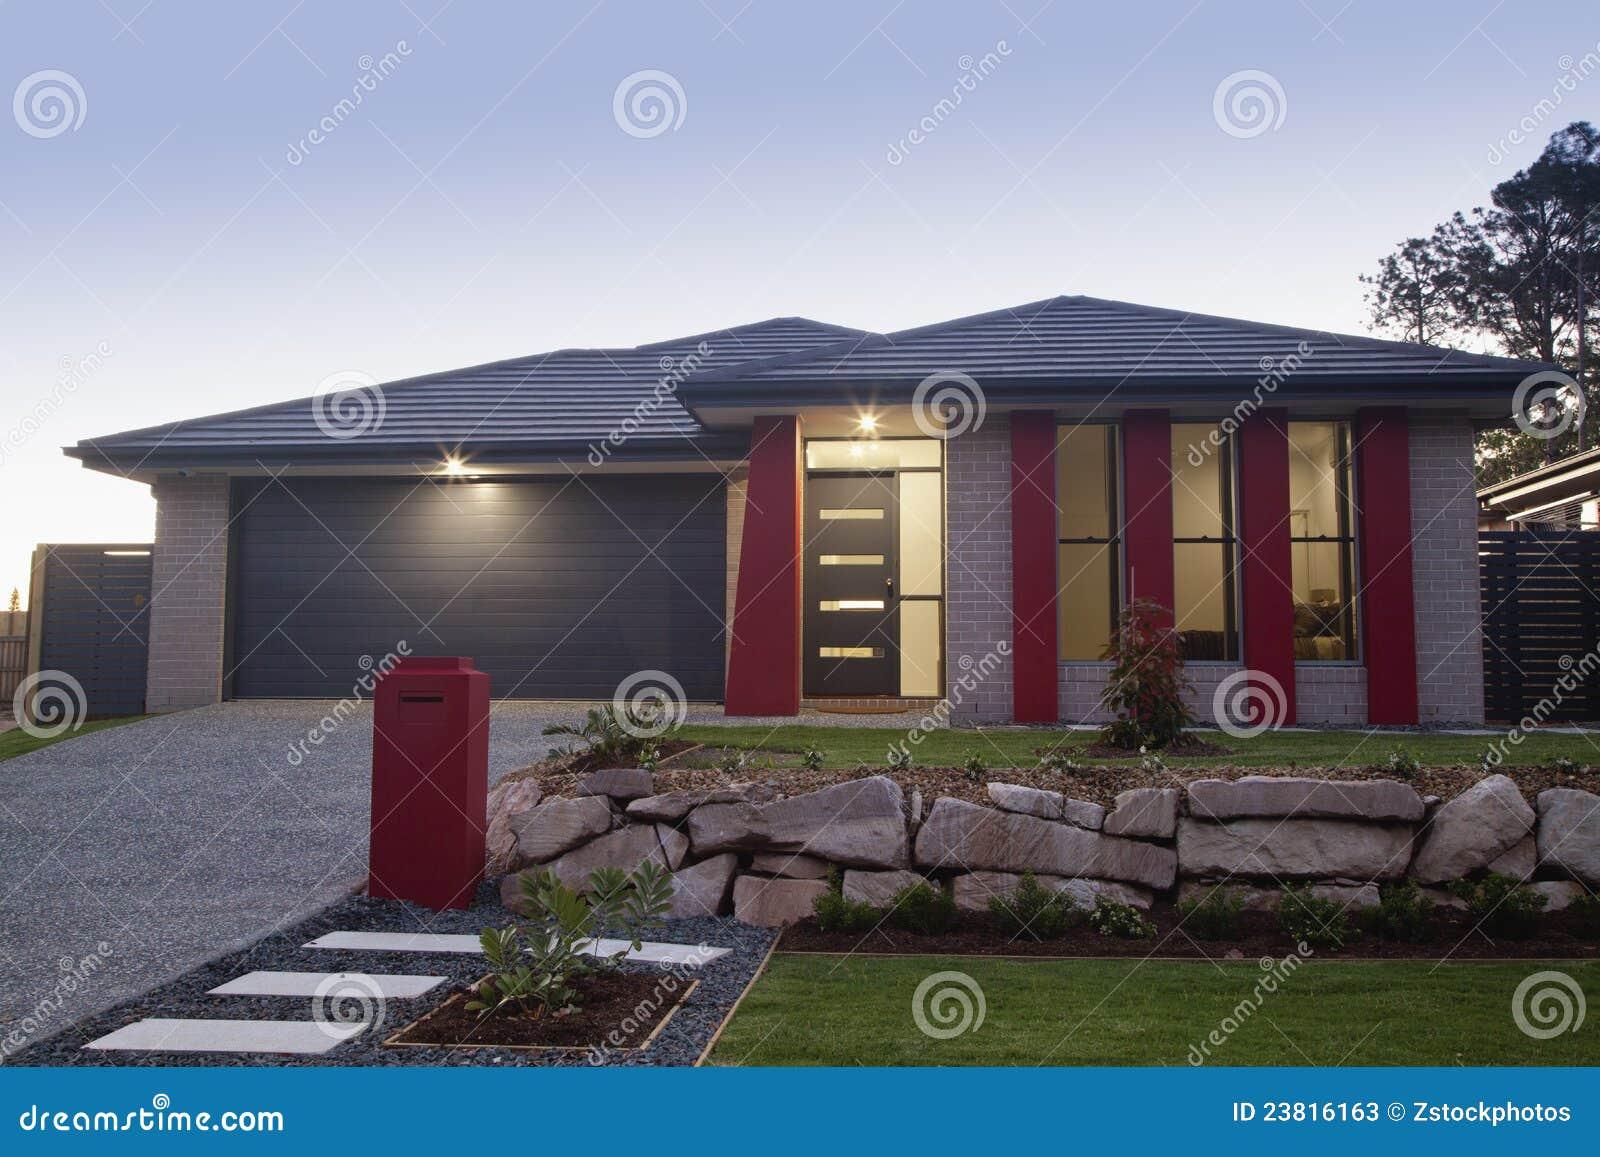 Avant suburbain de maison photos stock image 23816163 for Avant shampoing maison